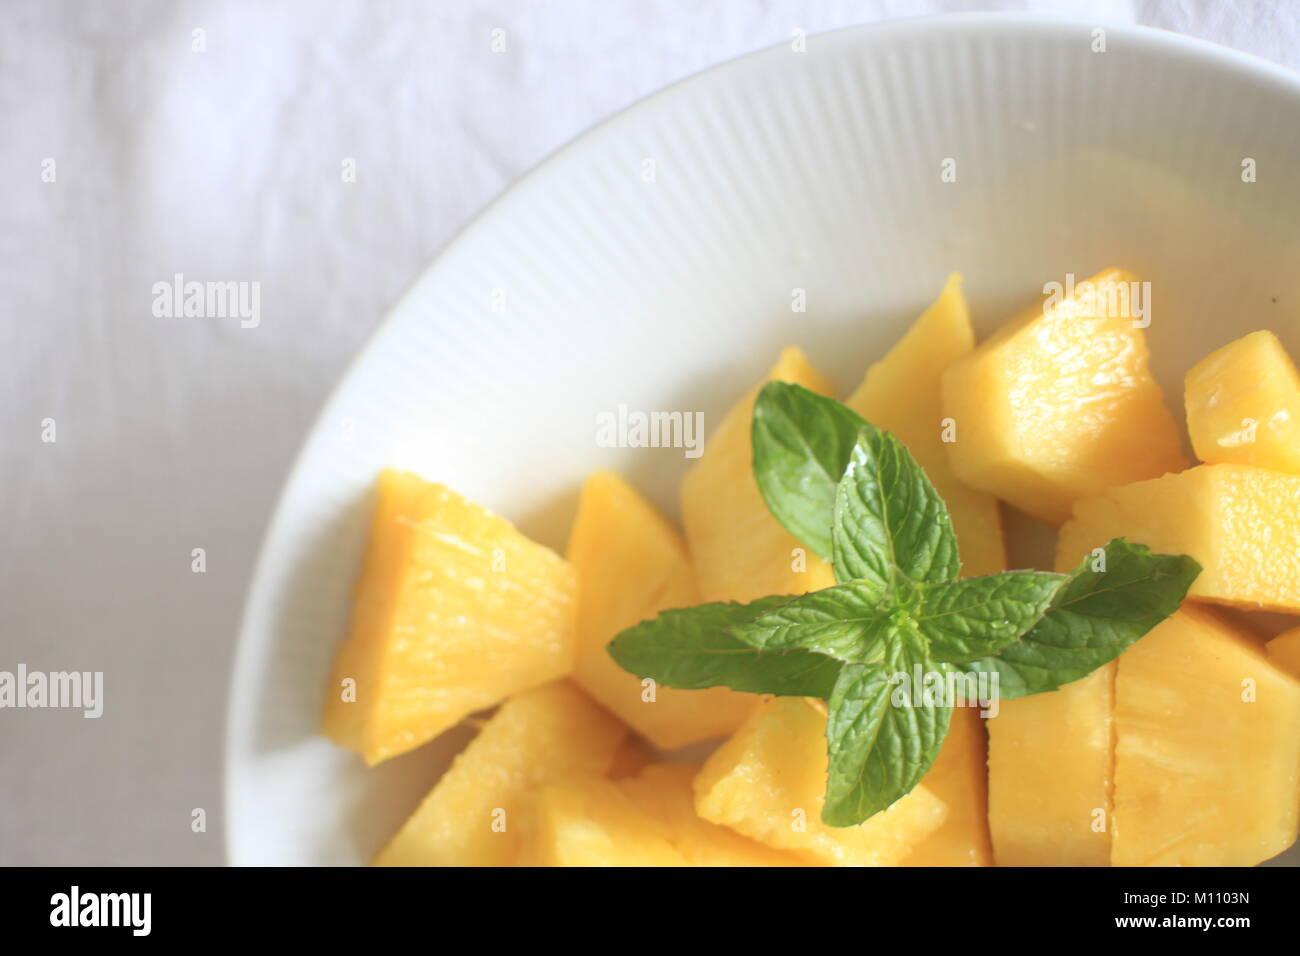 Die Platte gefüllt Mango Stockbild